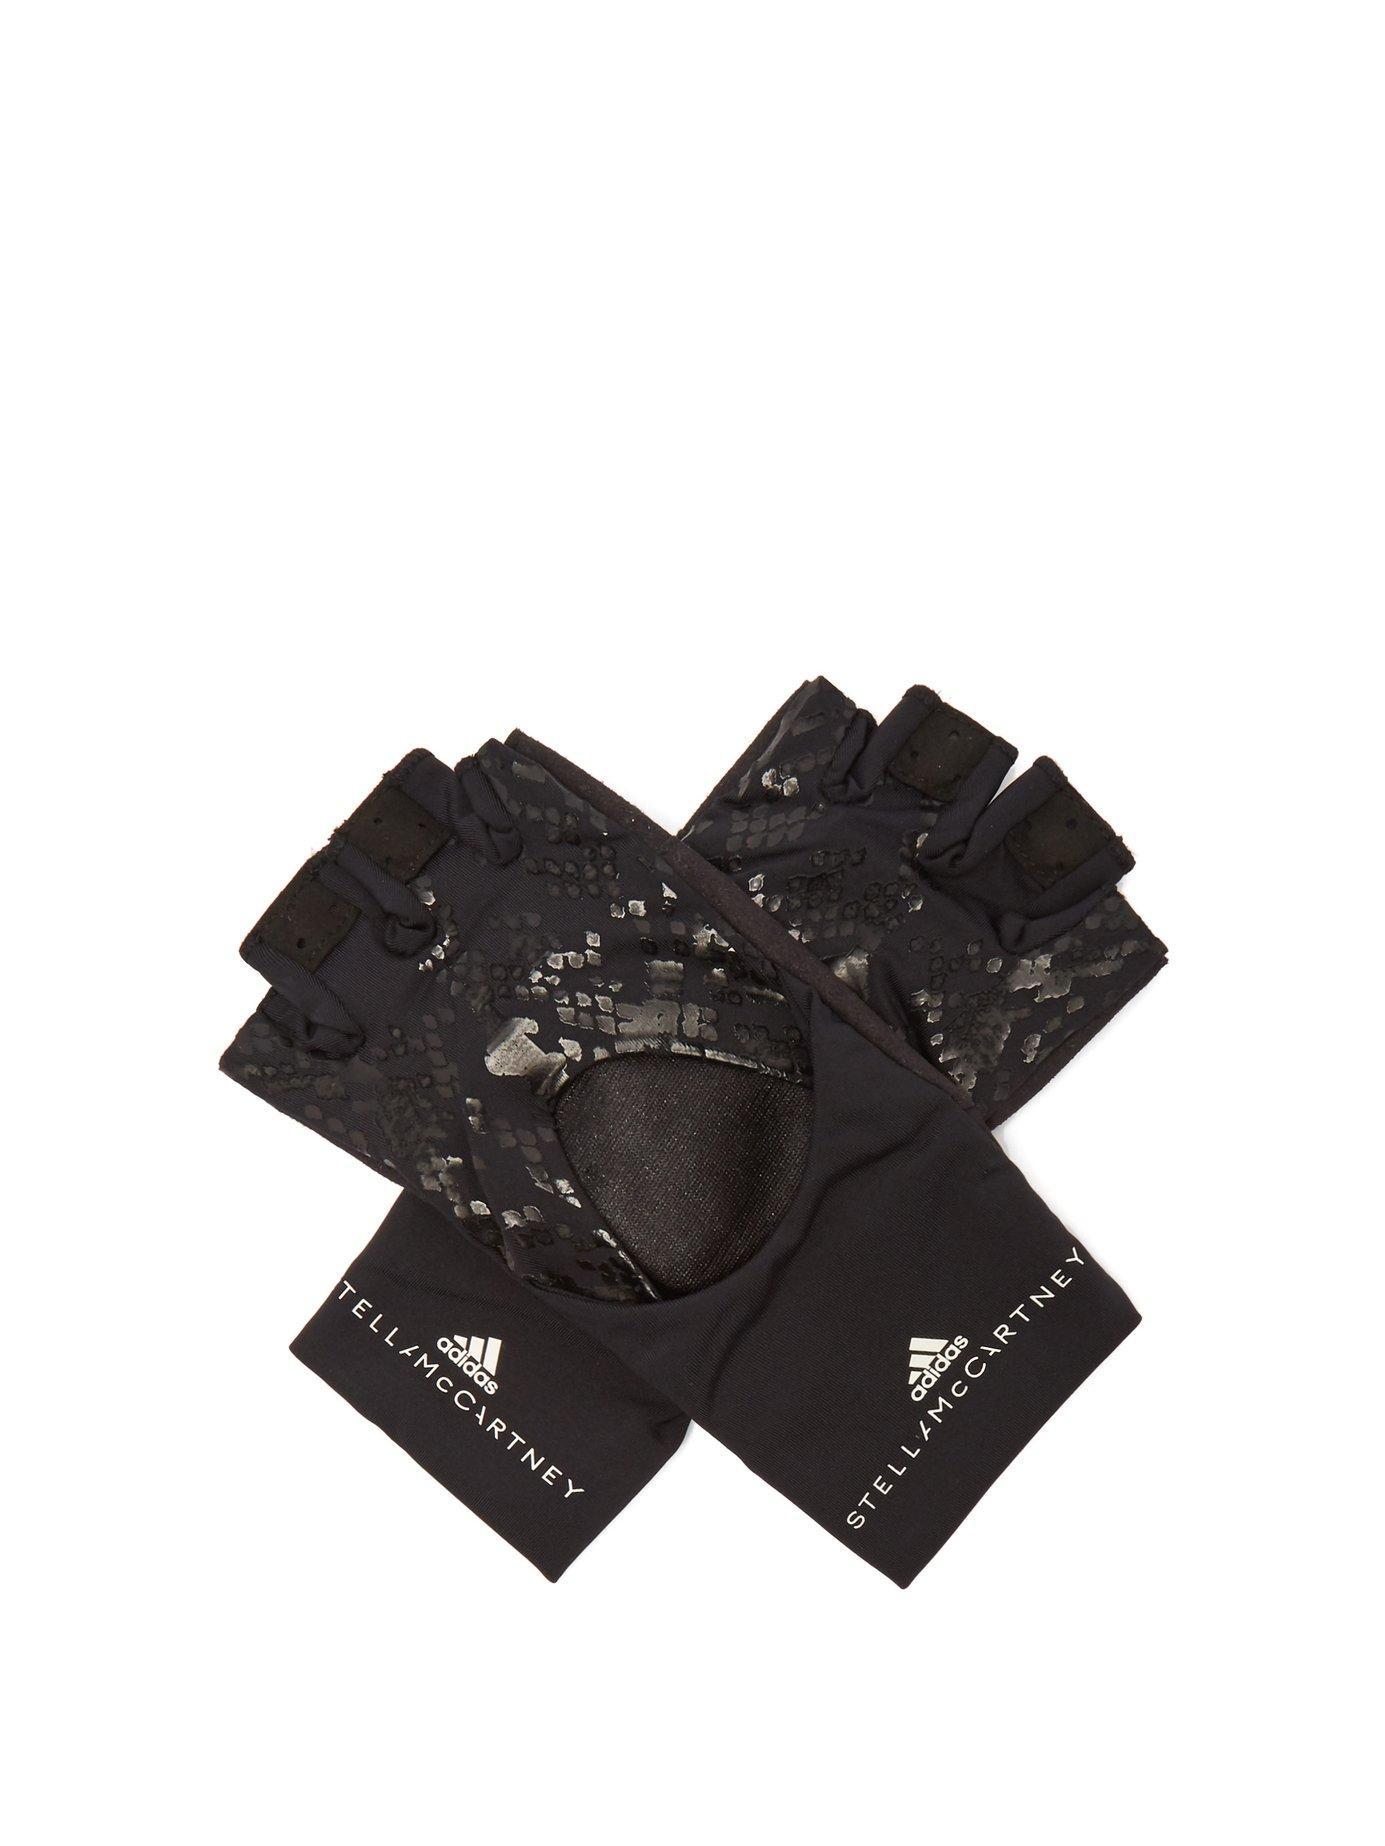 06ab3ec61 adidas By Stella McCartney. Women's Black Logo Print Fingerless Training  Gloves